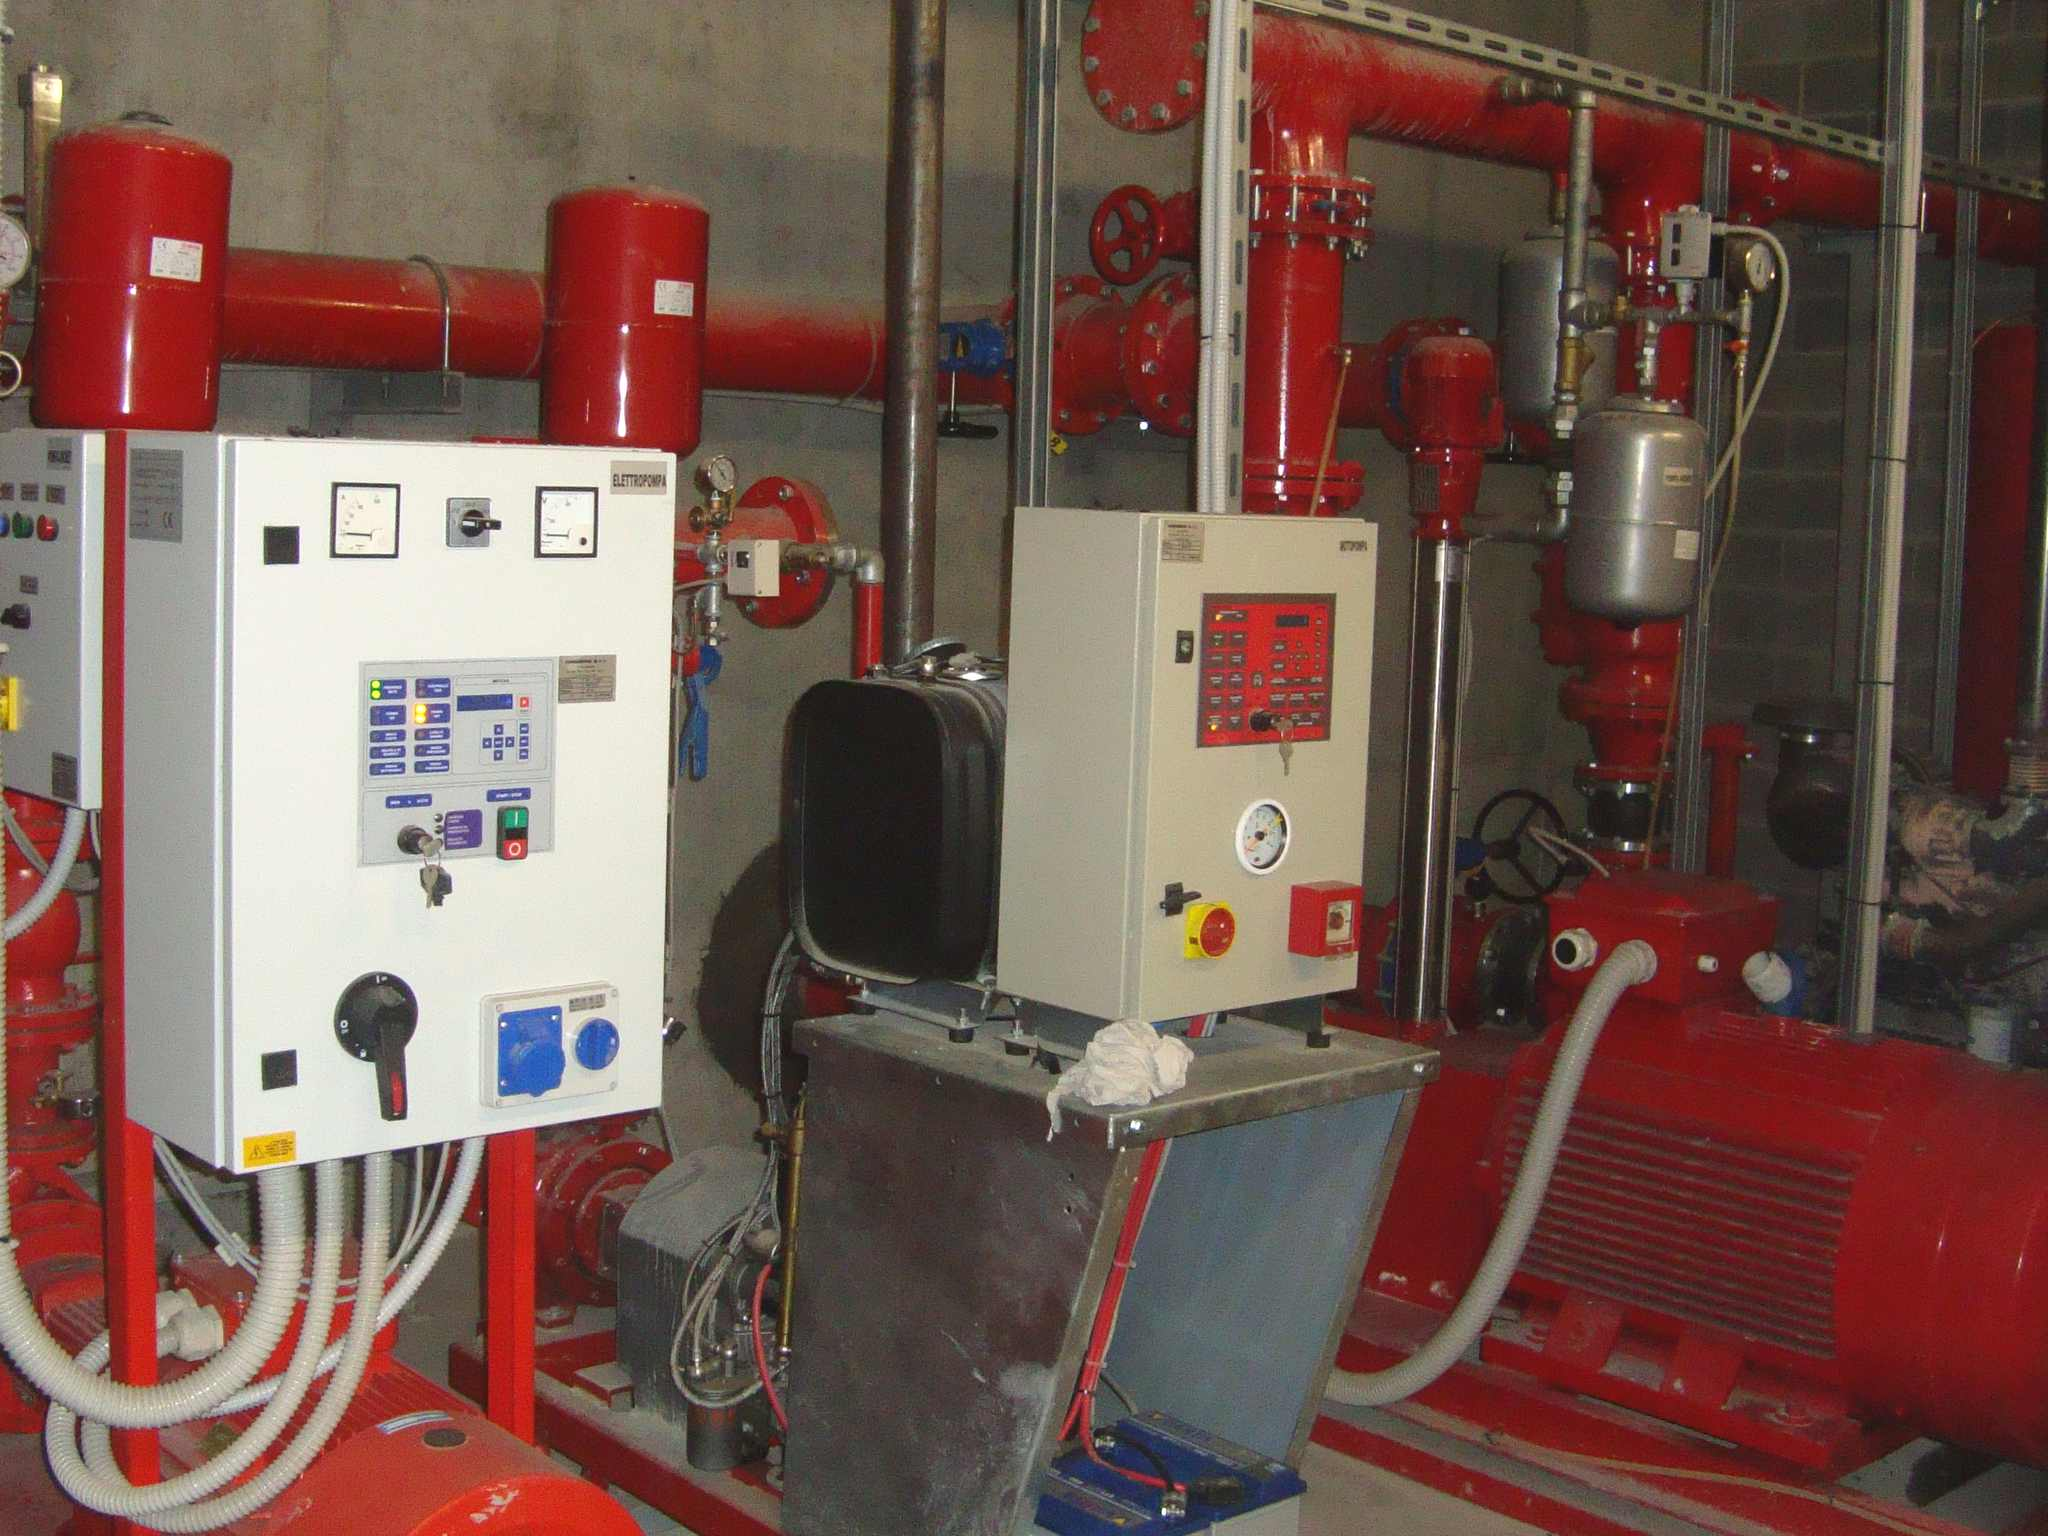 sistemi-antincendio-rimini-forli-cesena